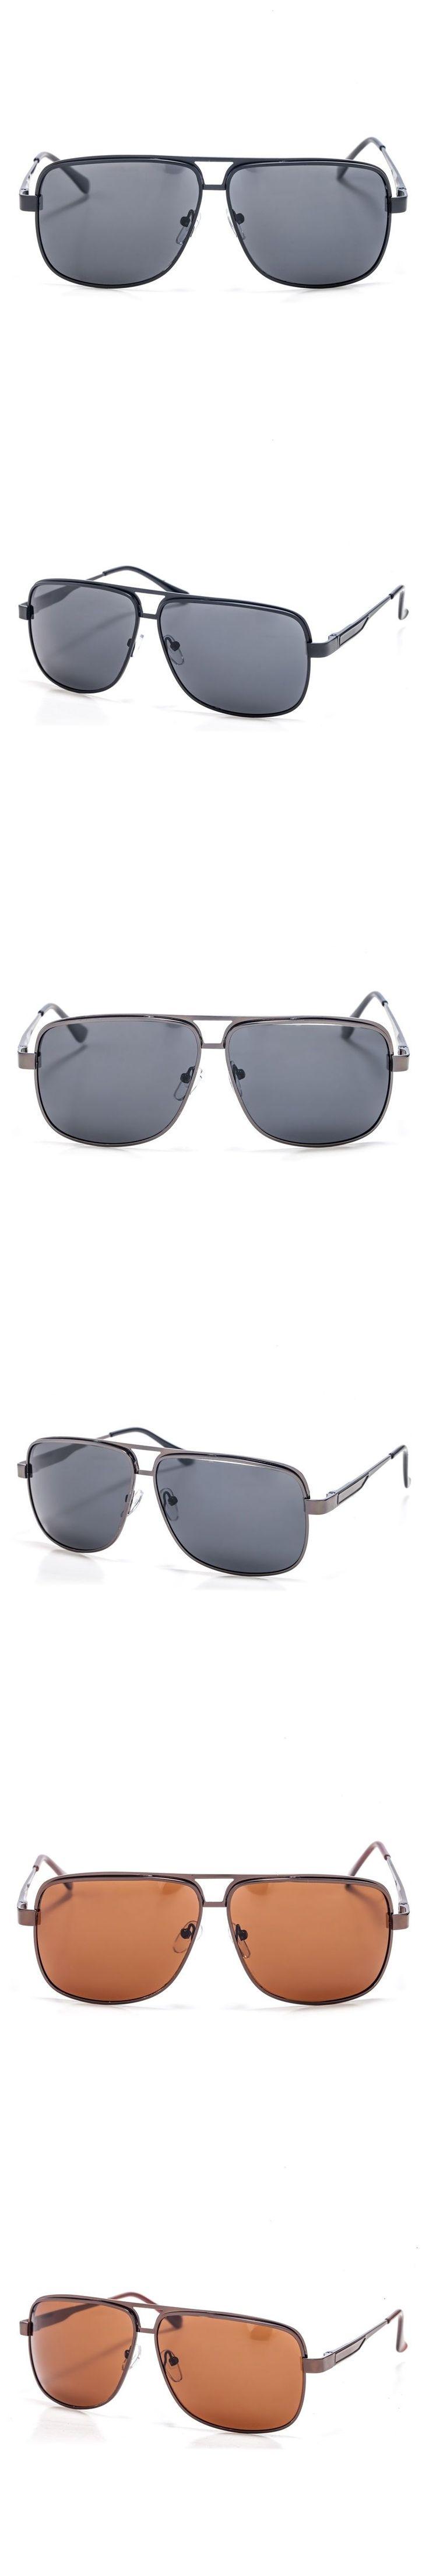 2017 Smileyes Fashion men Sunglasses Pilots style Popular Brand Designer Sun Glasses For men sun Glass male for driver